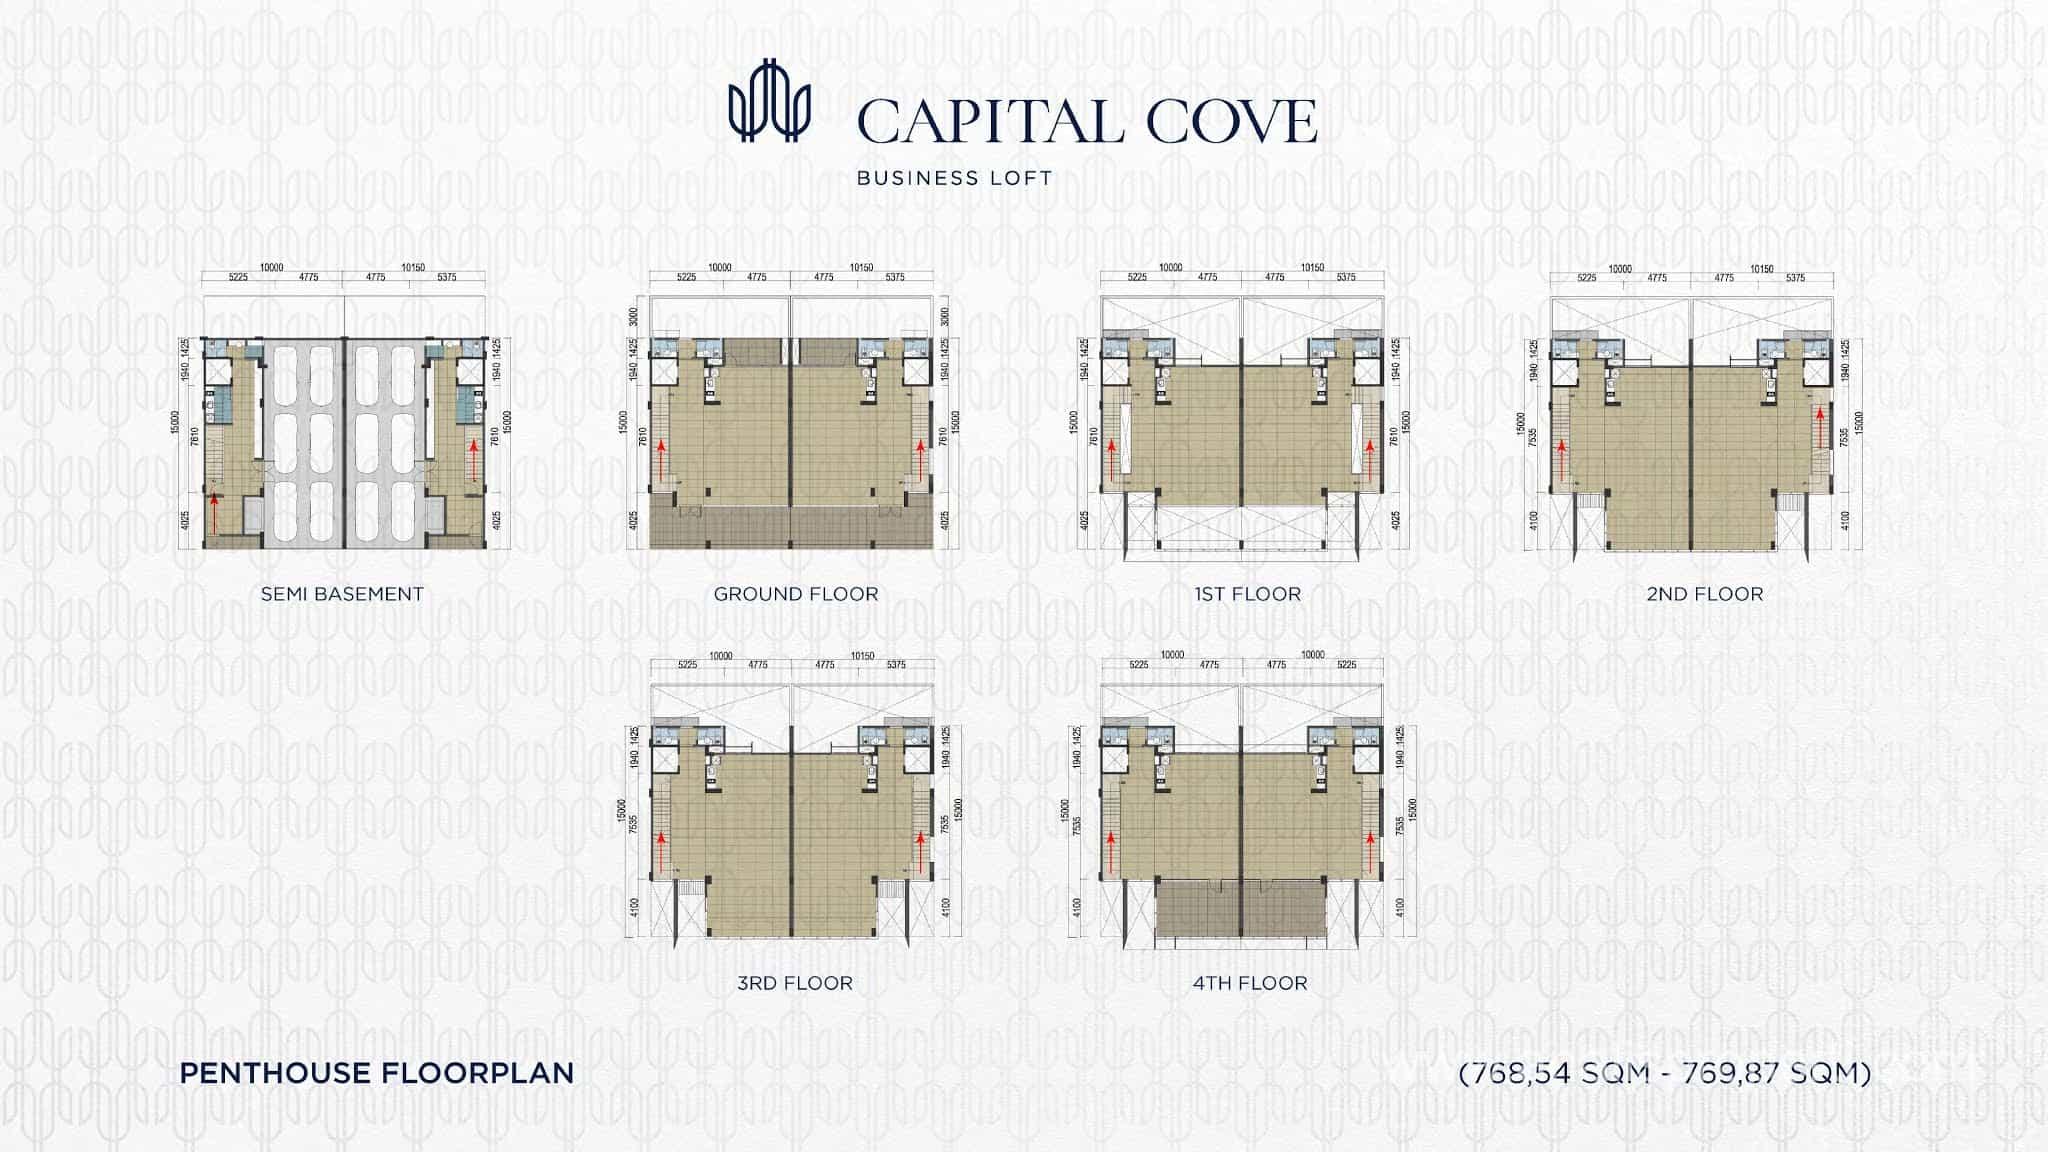 Denah Capital Cove Tipe Penthouse